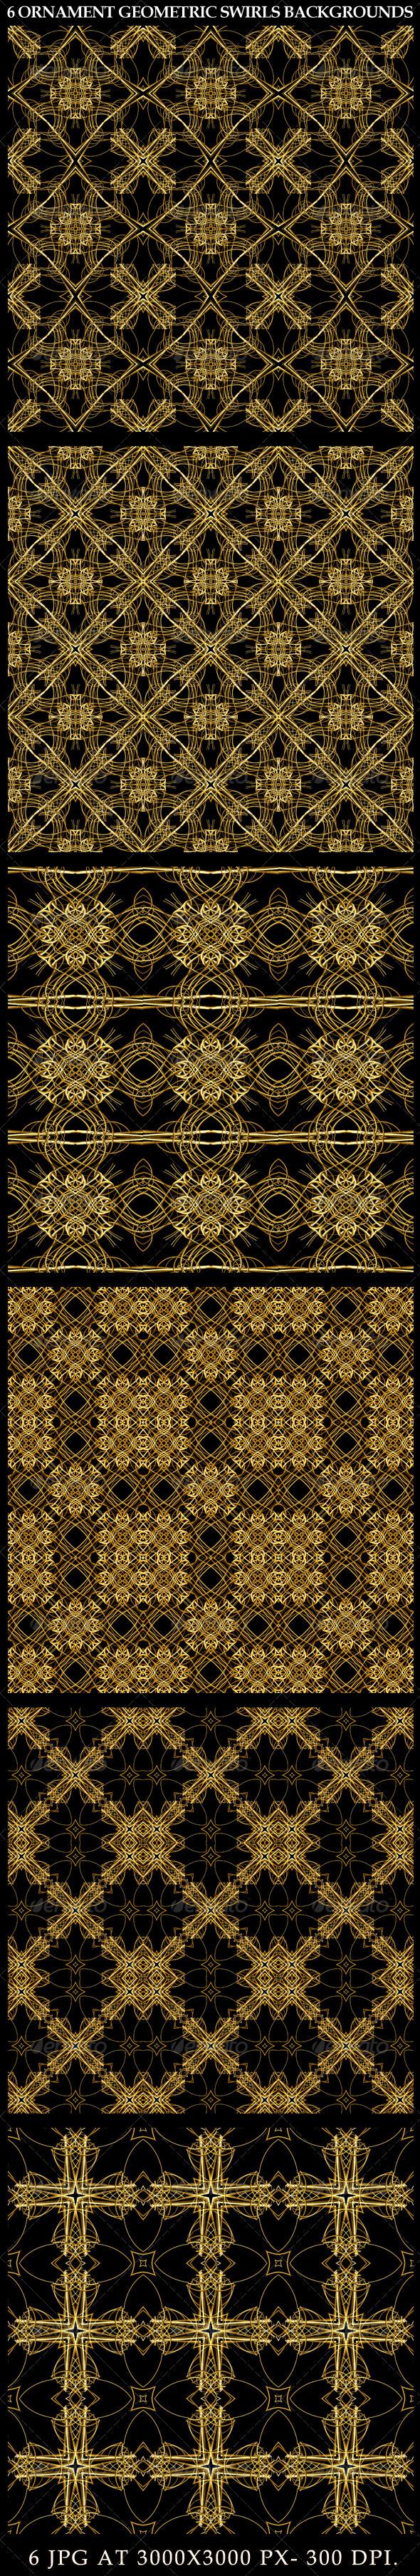 6 Ornament Geometric Swirls Backgrounds - Patterns Decorative